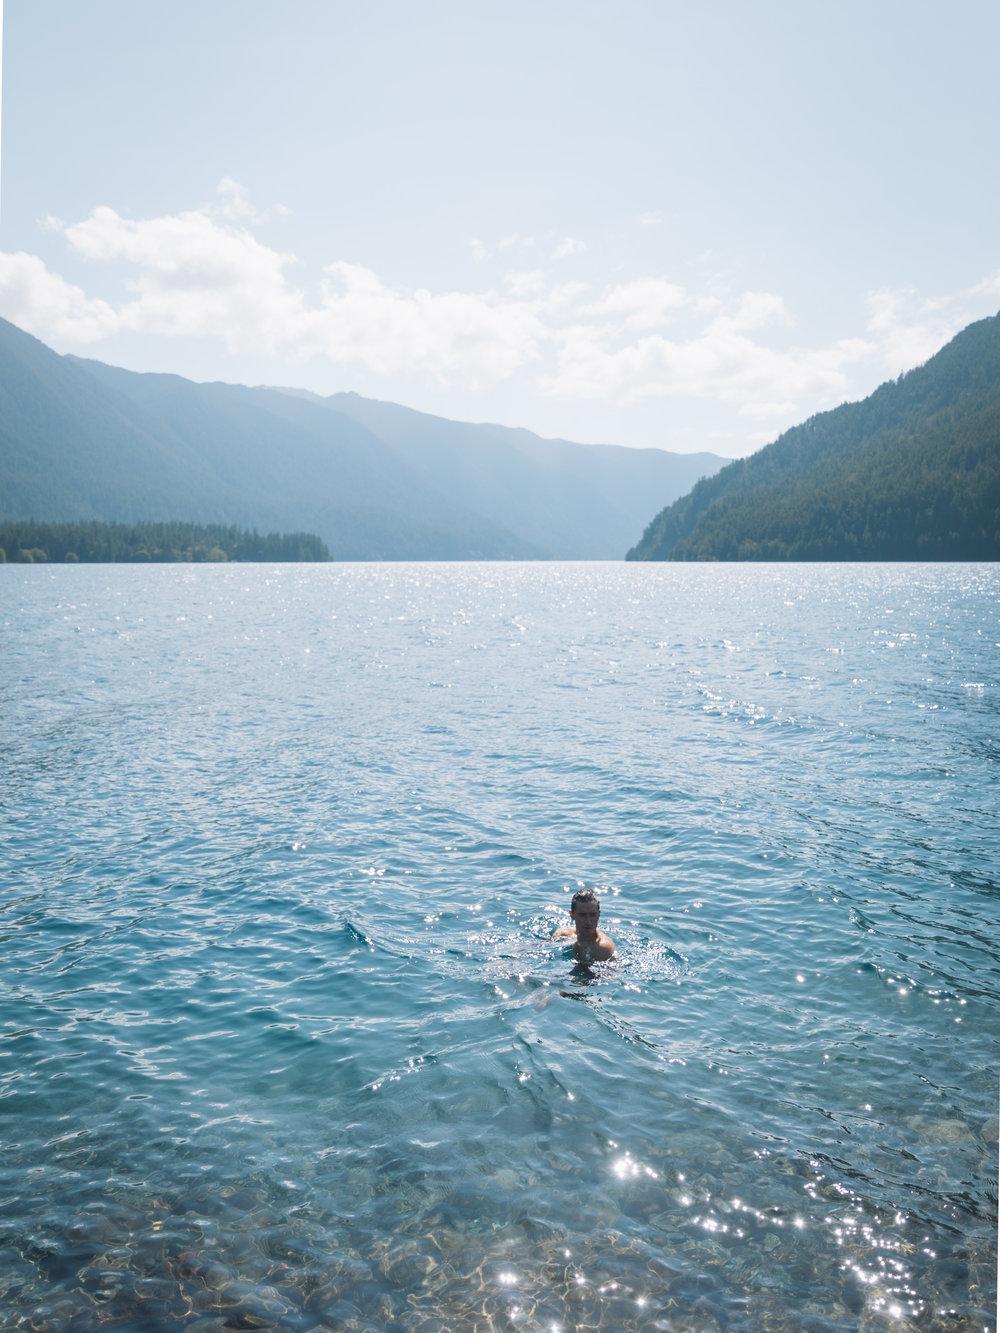 PNW_TomSwimming.jpg